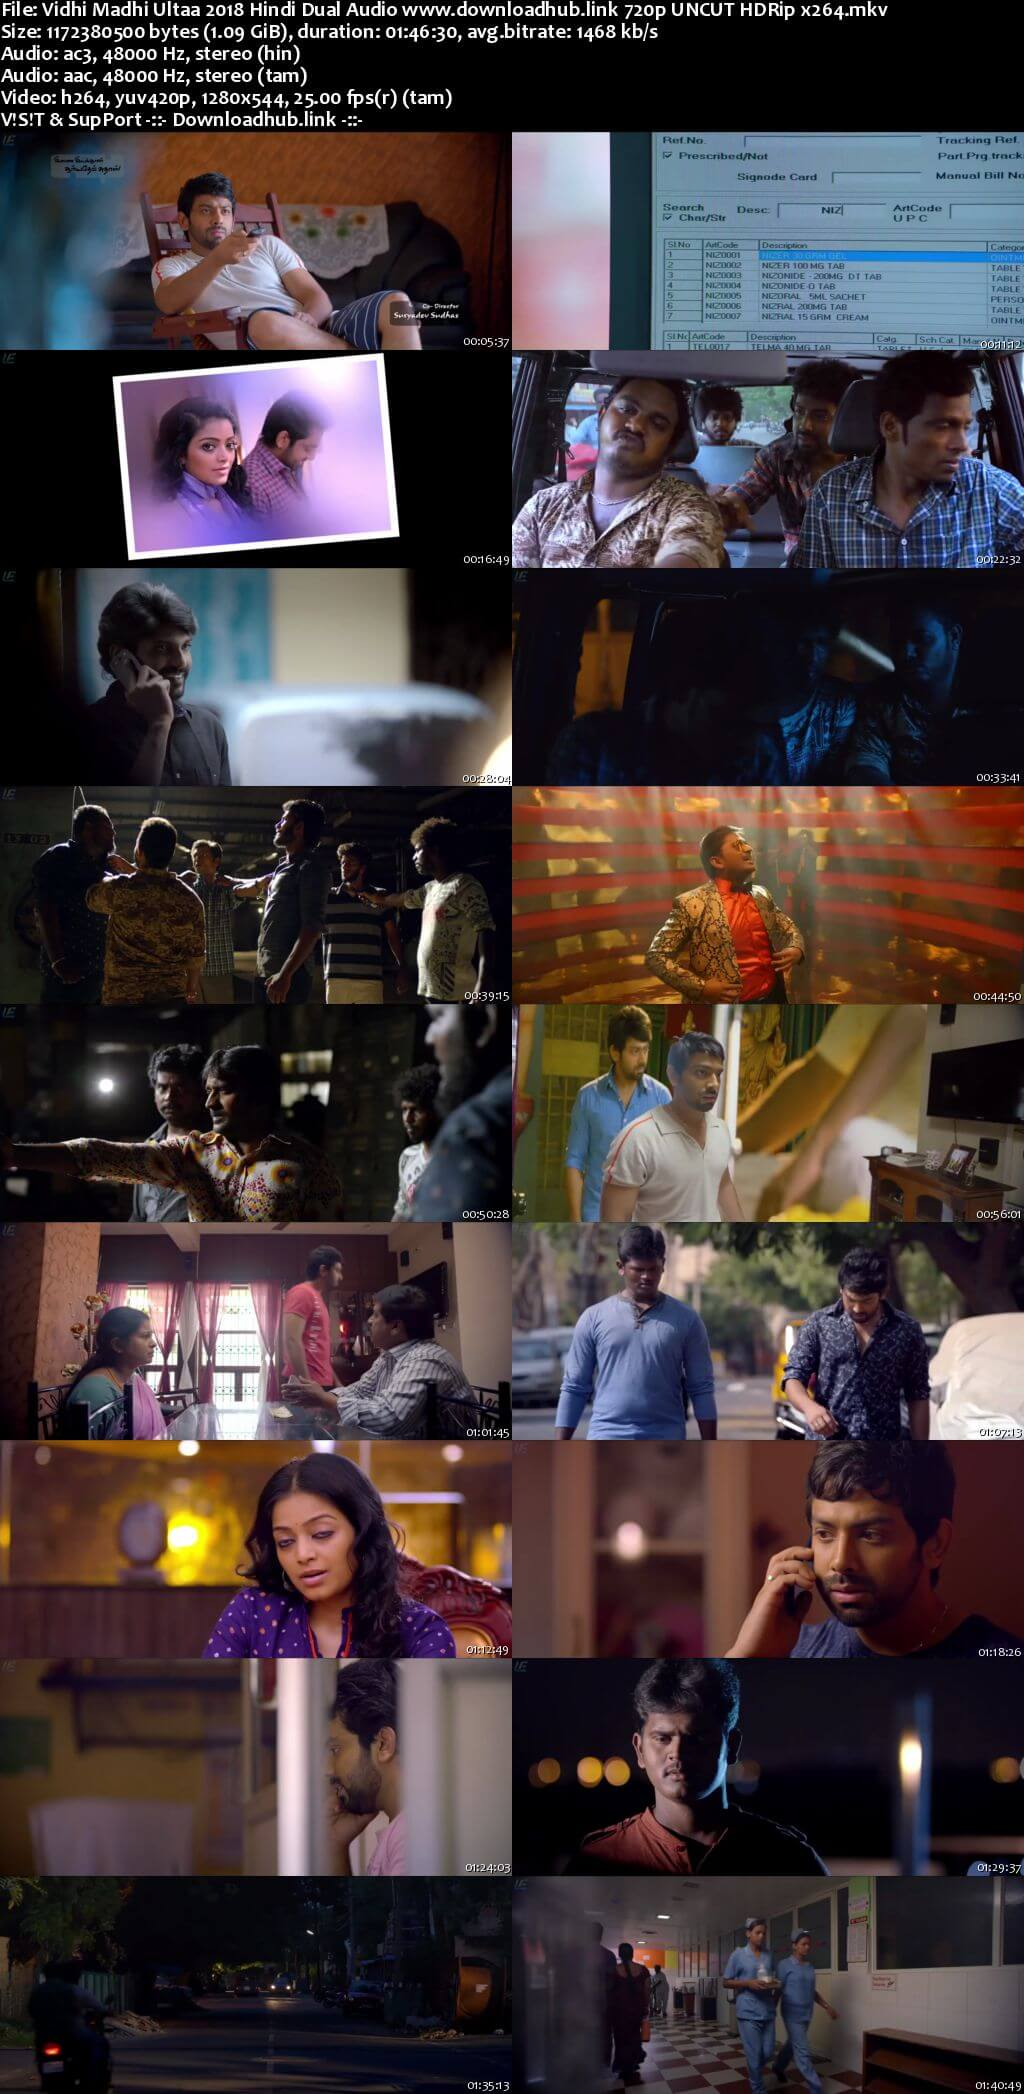 Vidhi Madhi Ultaa 2018 Hindi Dual Audio 720p UNCUT HDRip x264